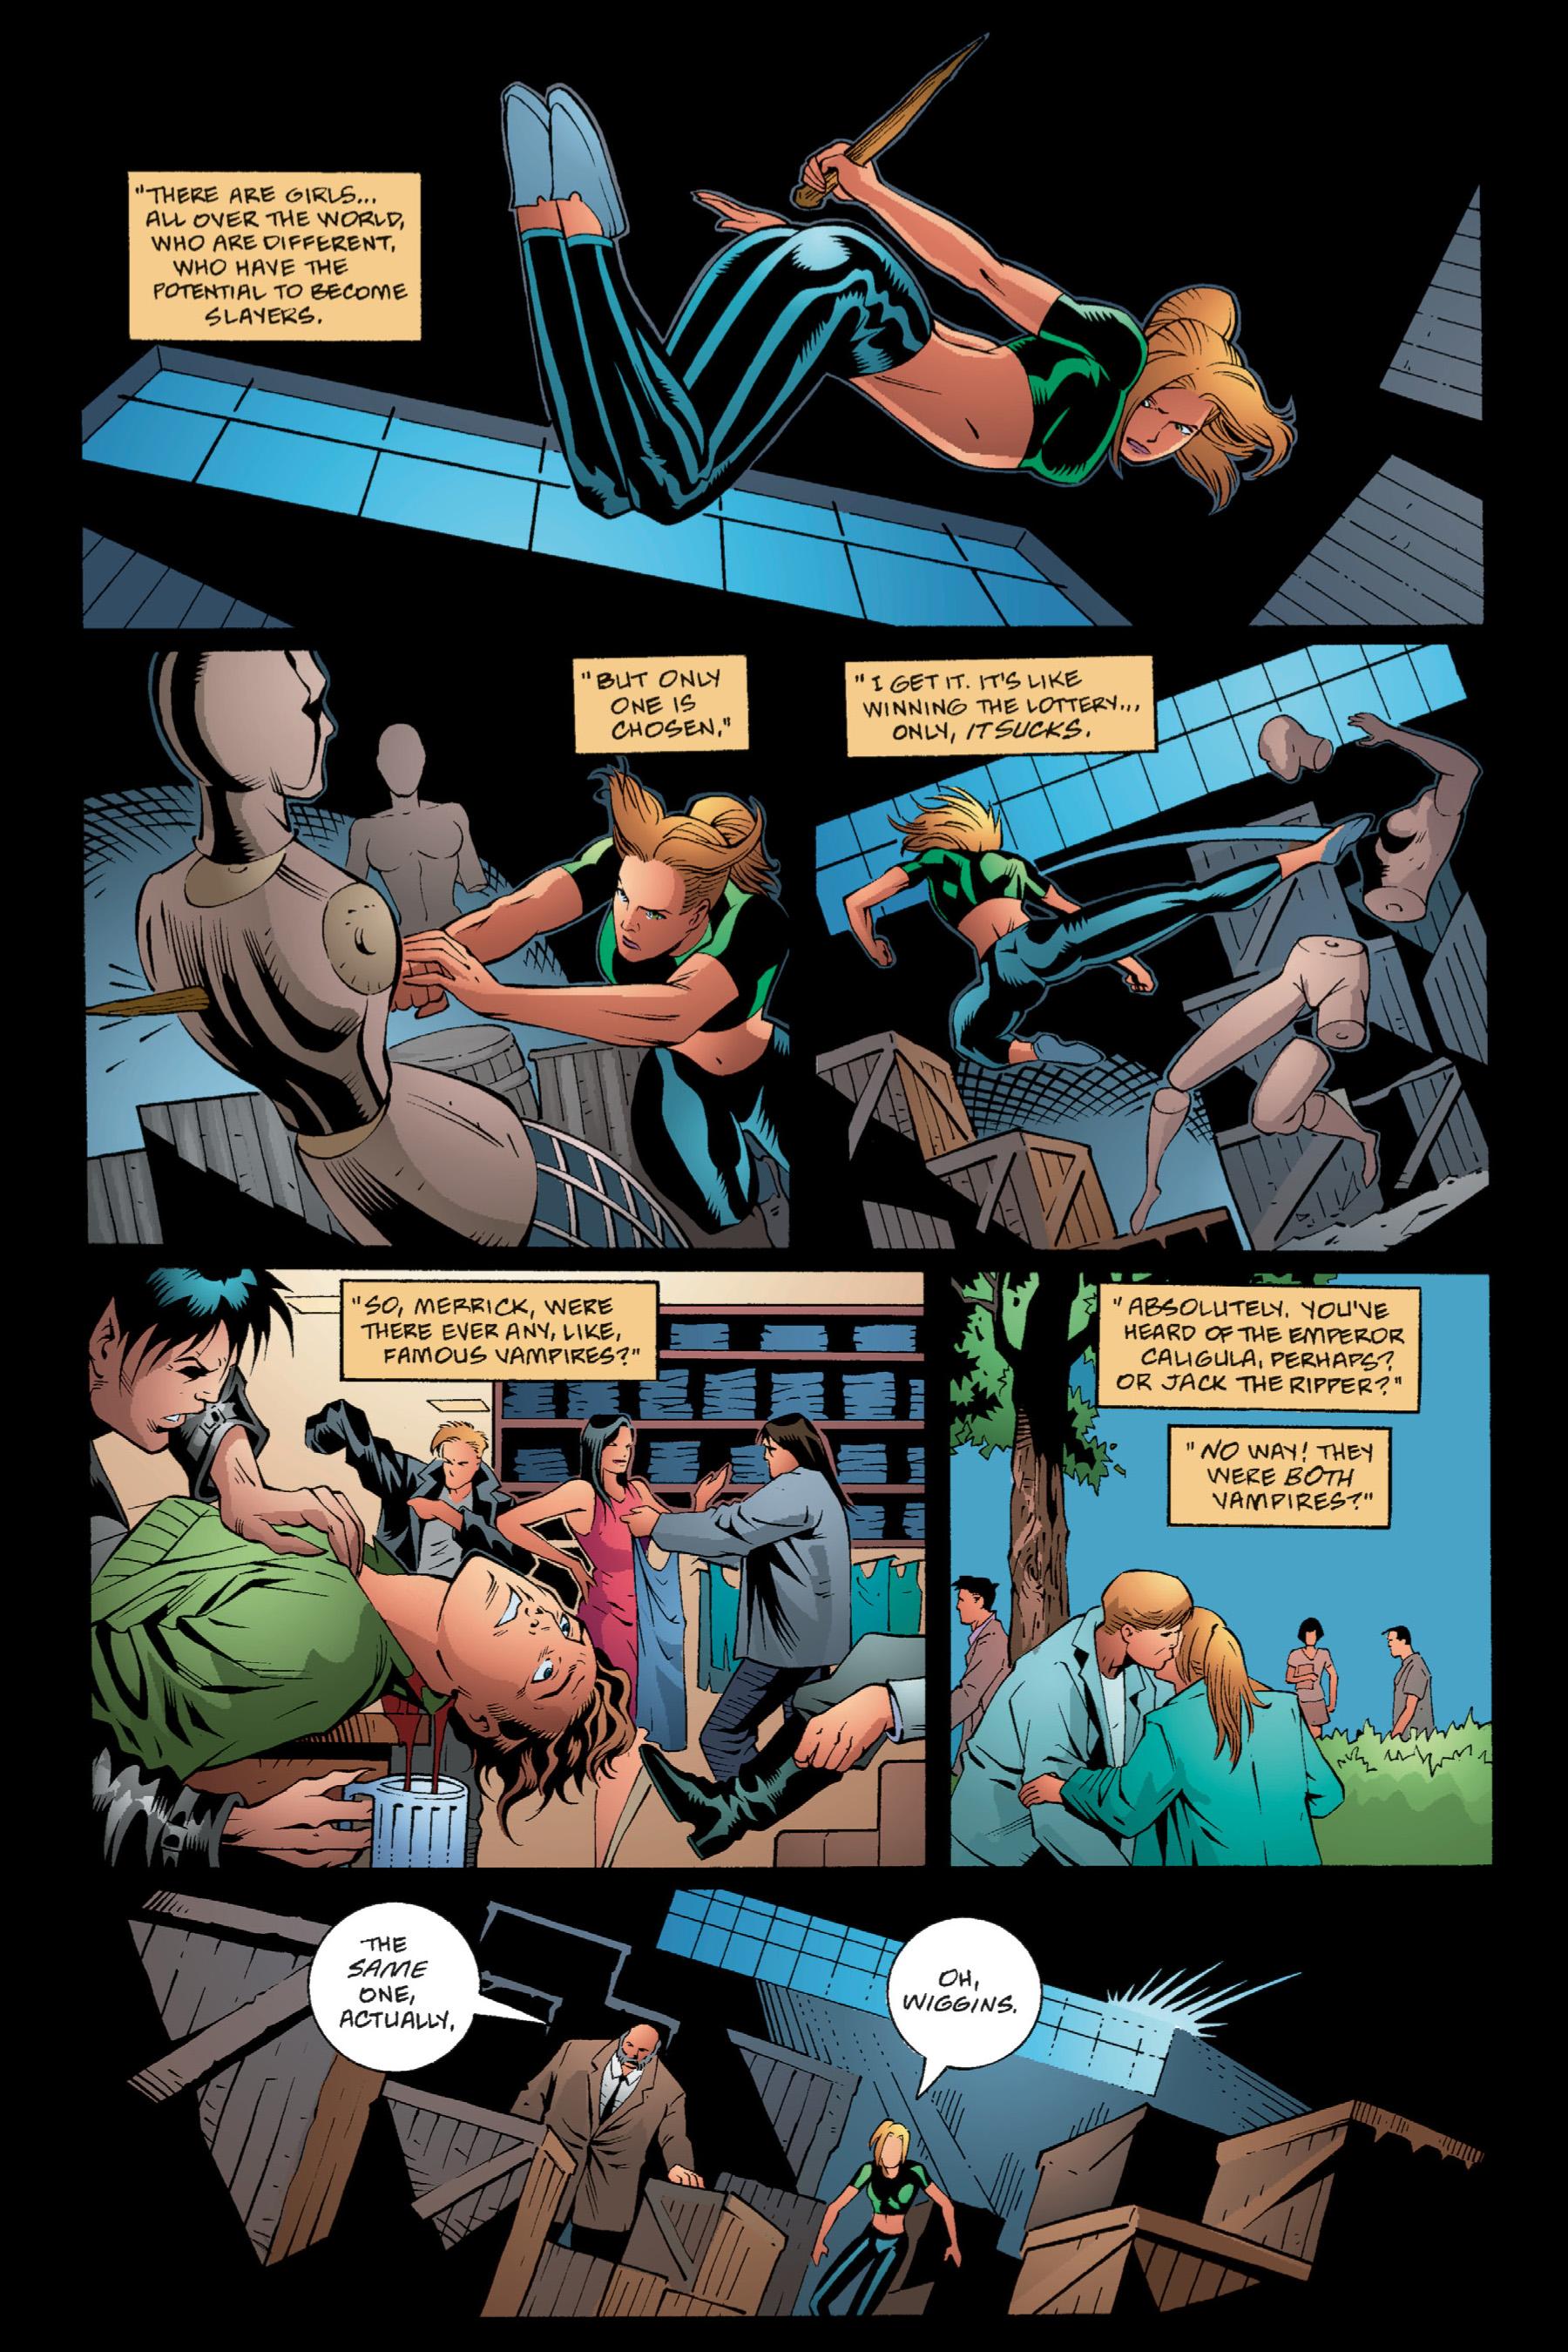 Read online Buffy the Vampire Slayer: Omnibus comic -  Issue # TPB 1 - 63